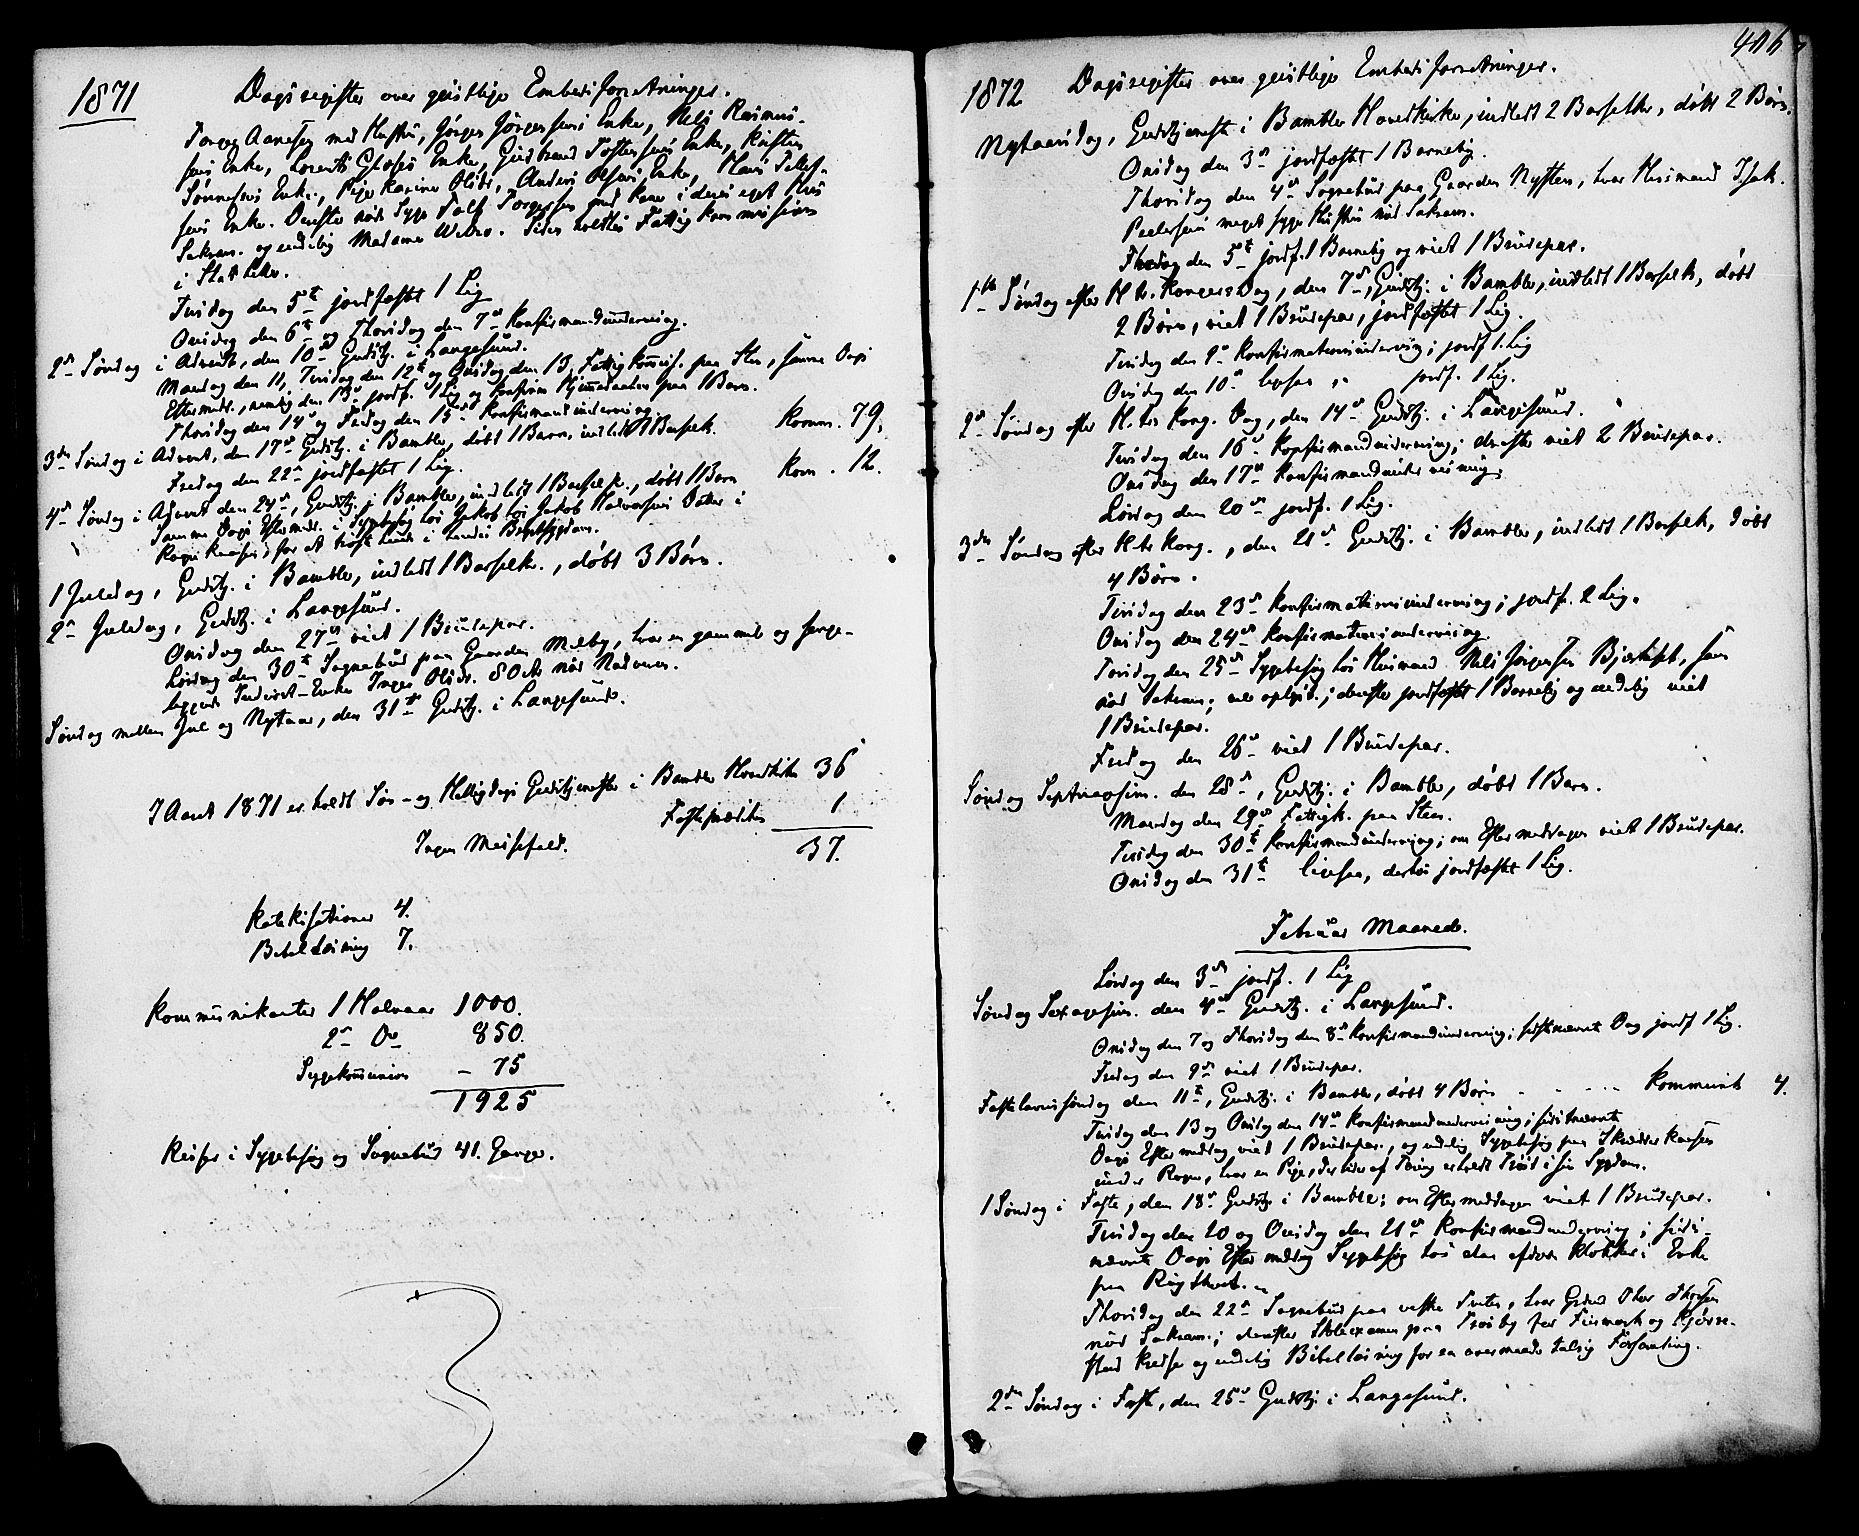 SAKO, Bamble kirkebøker, F/Fa/L0006: Ministerialbok nr. I 6, 1869-1877, s. 406